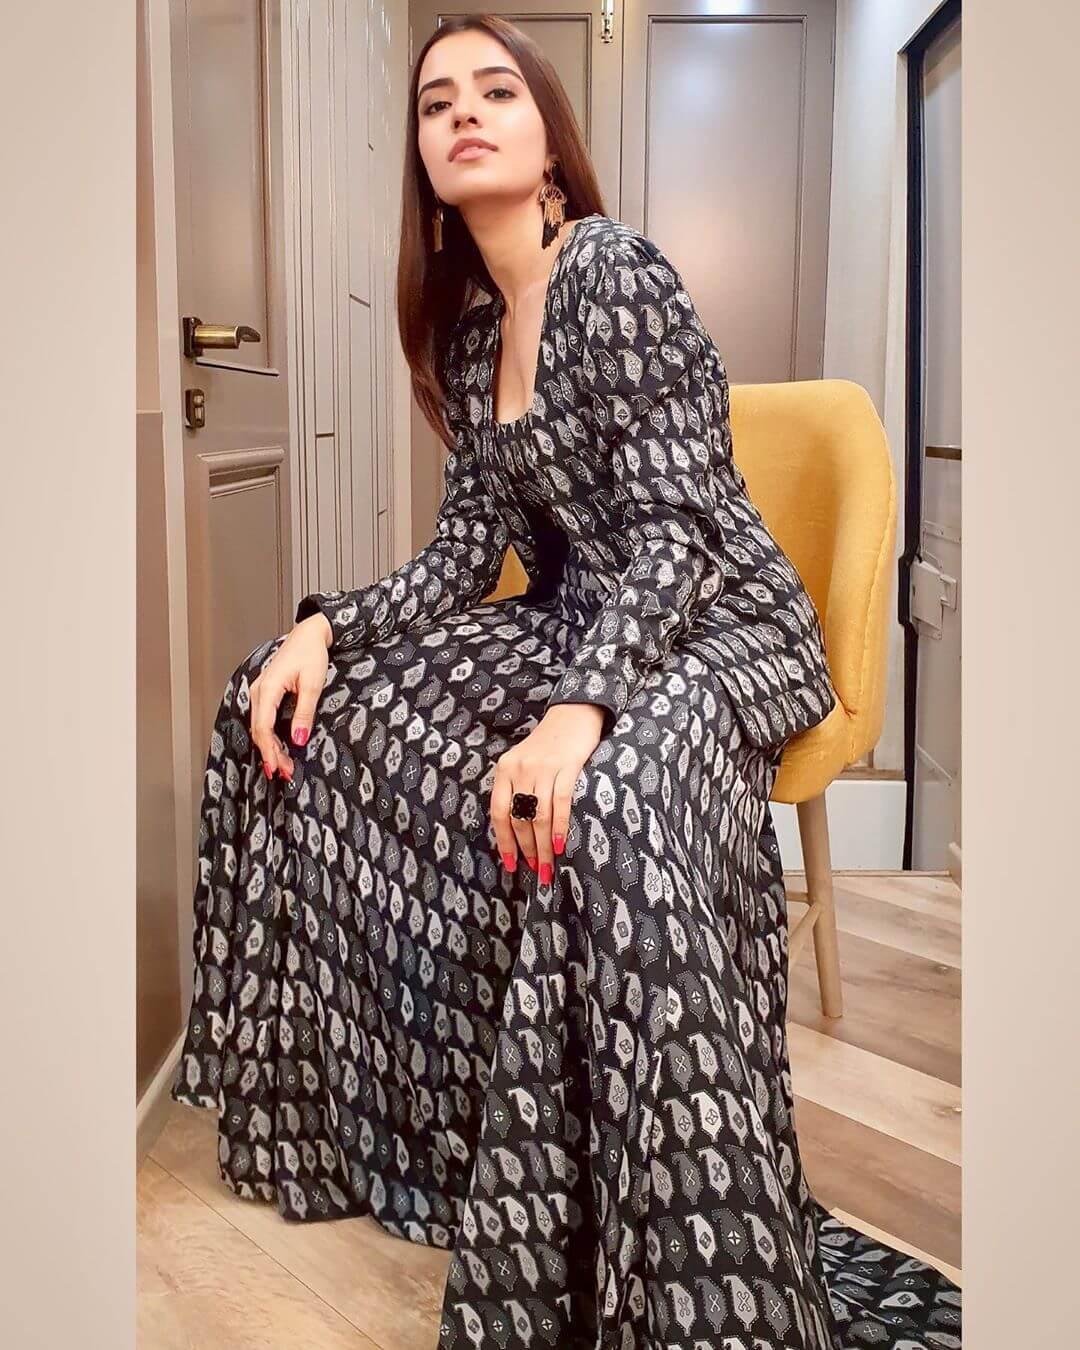 actress Rukshar Dhillon wiki